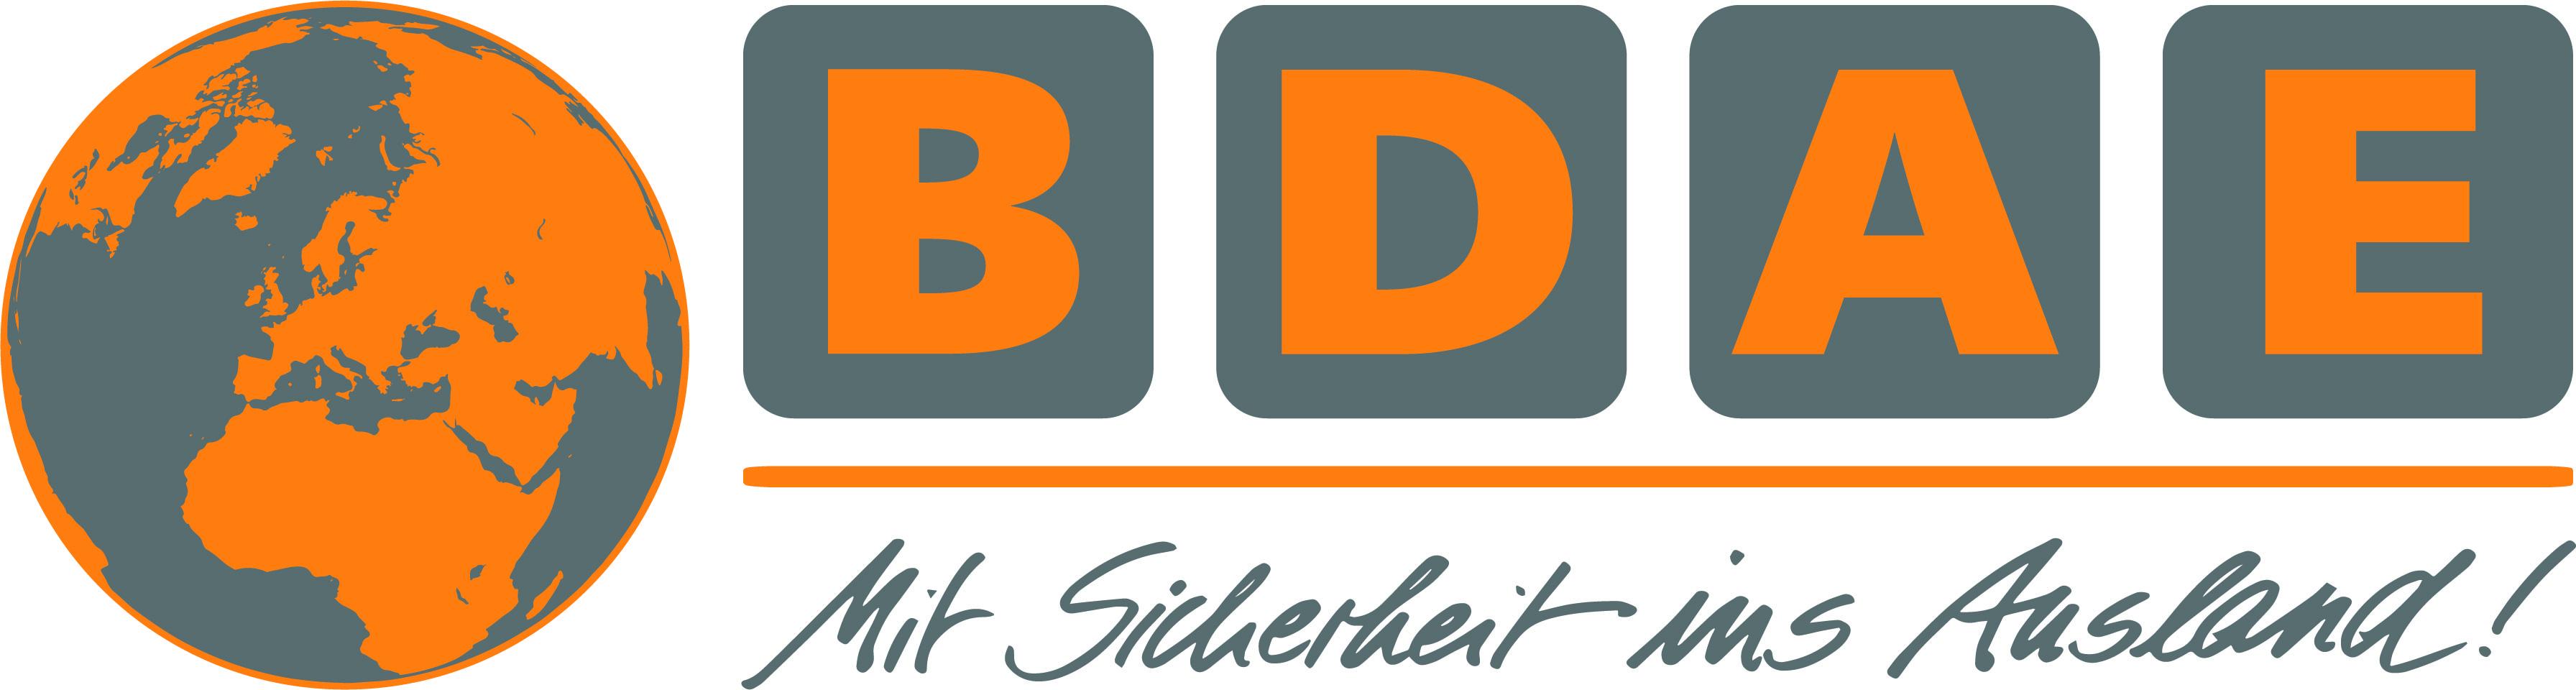 BDAE Gruppe